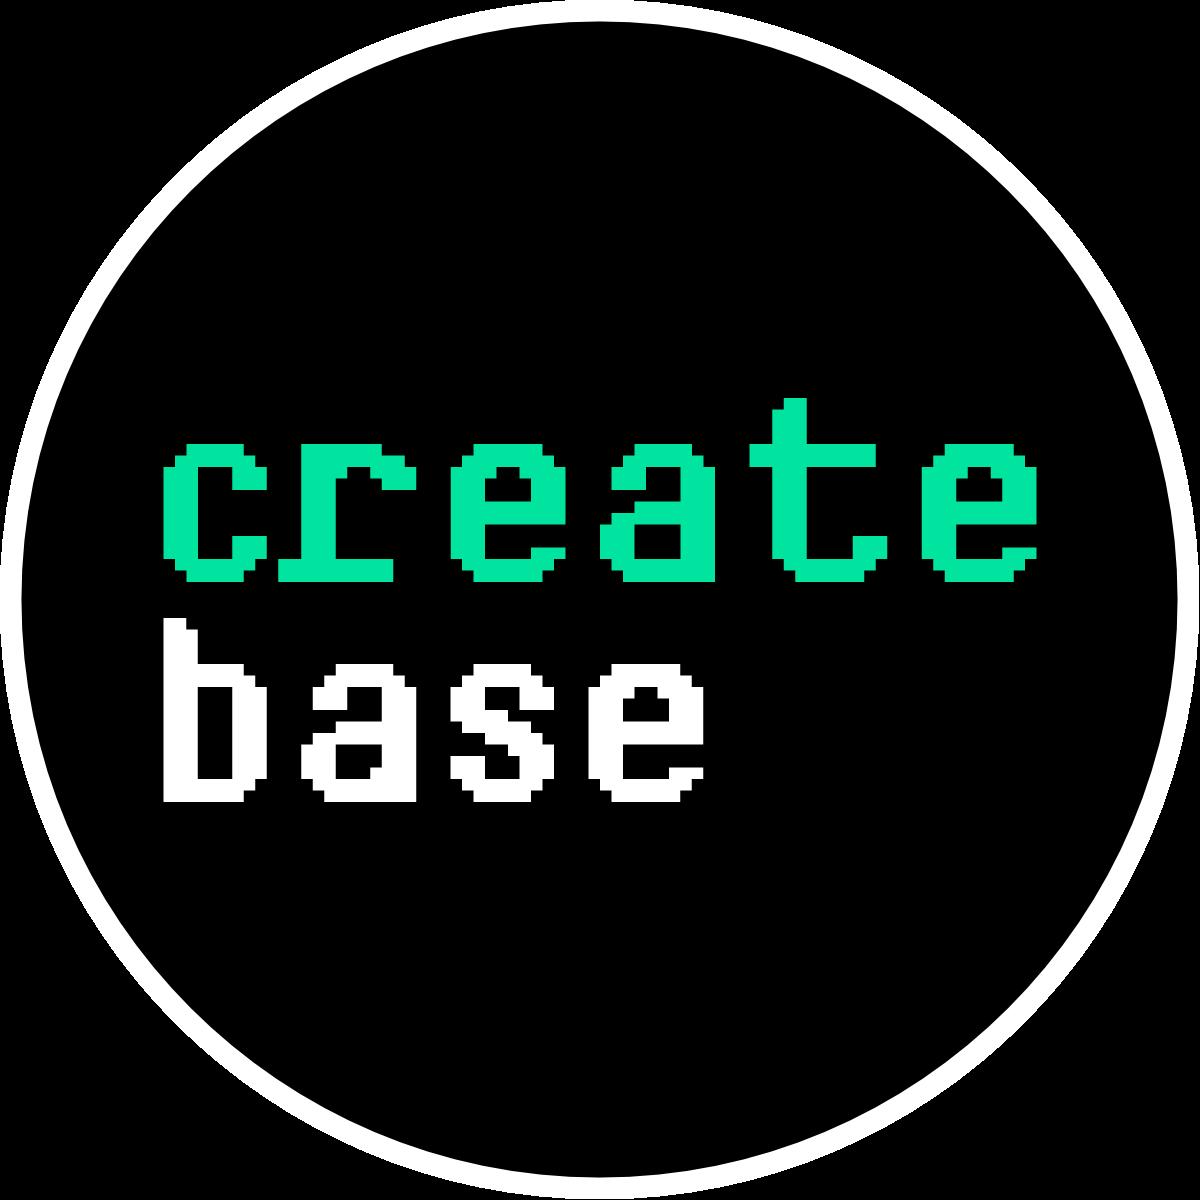 Createbase logo